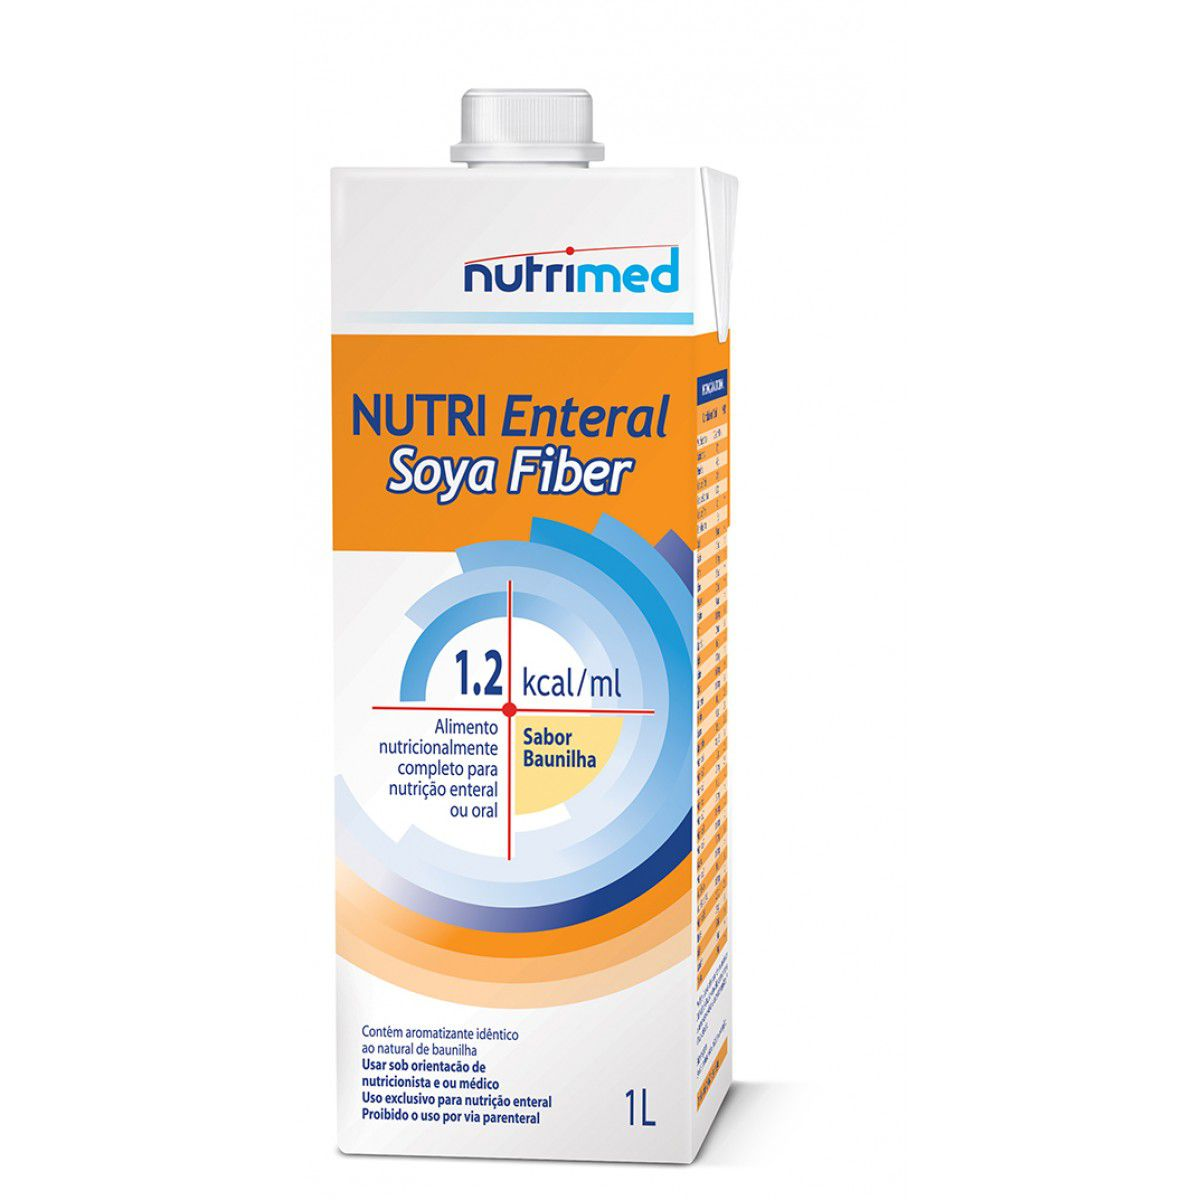 Nutri Enteral Soya Fiber Tetra Pak - 1 L  - (Danone)